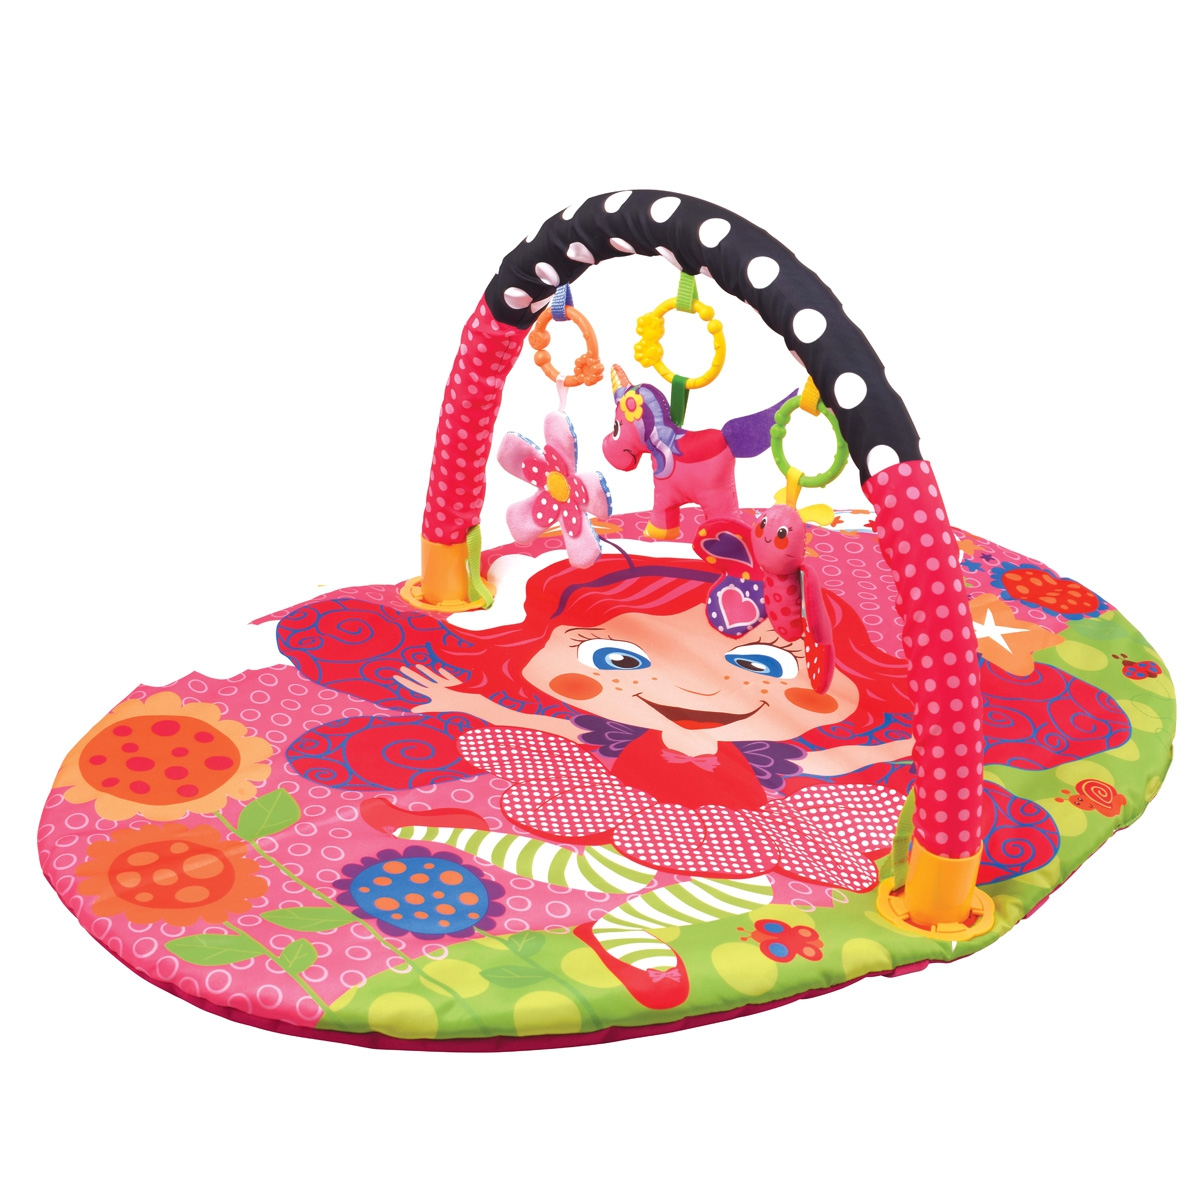 Развивающий коврик, Цветочная принцесса, 1шт., Ути Пути 49386, Китай, Мультиколор  - купить со скидкой